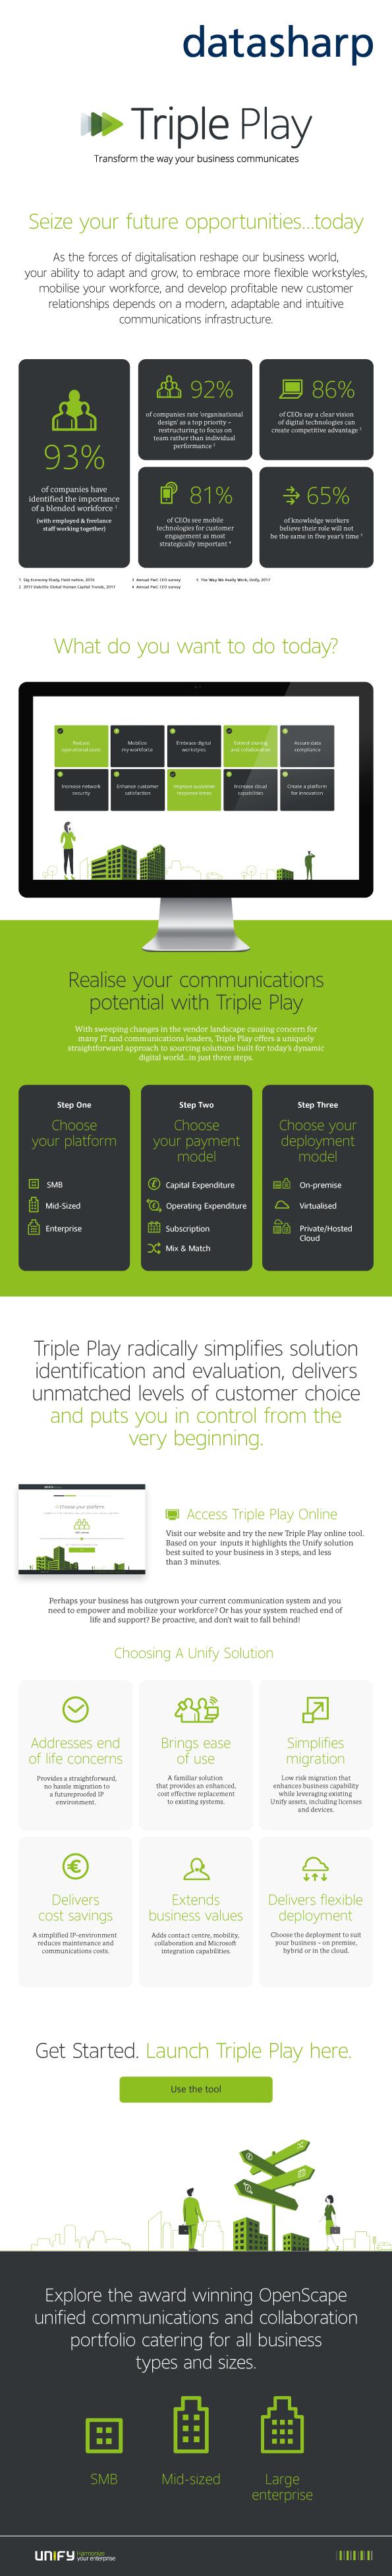 Unify Triple Play